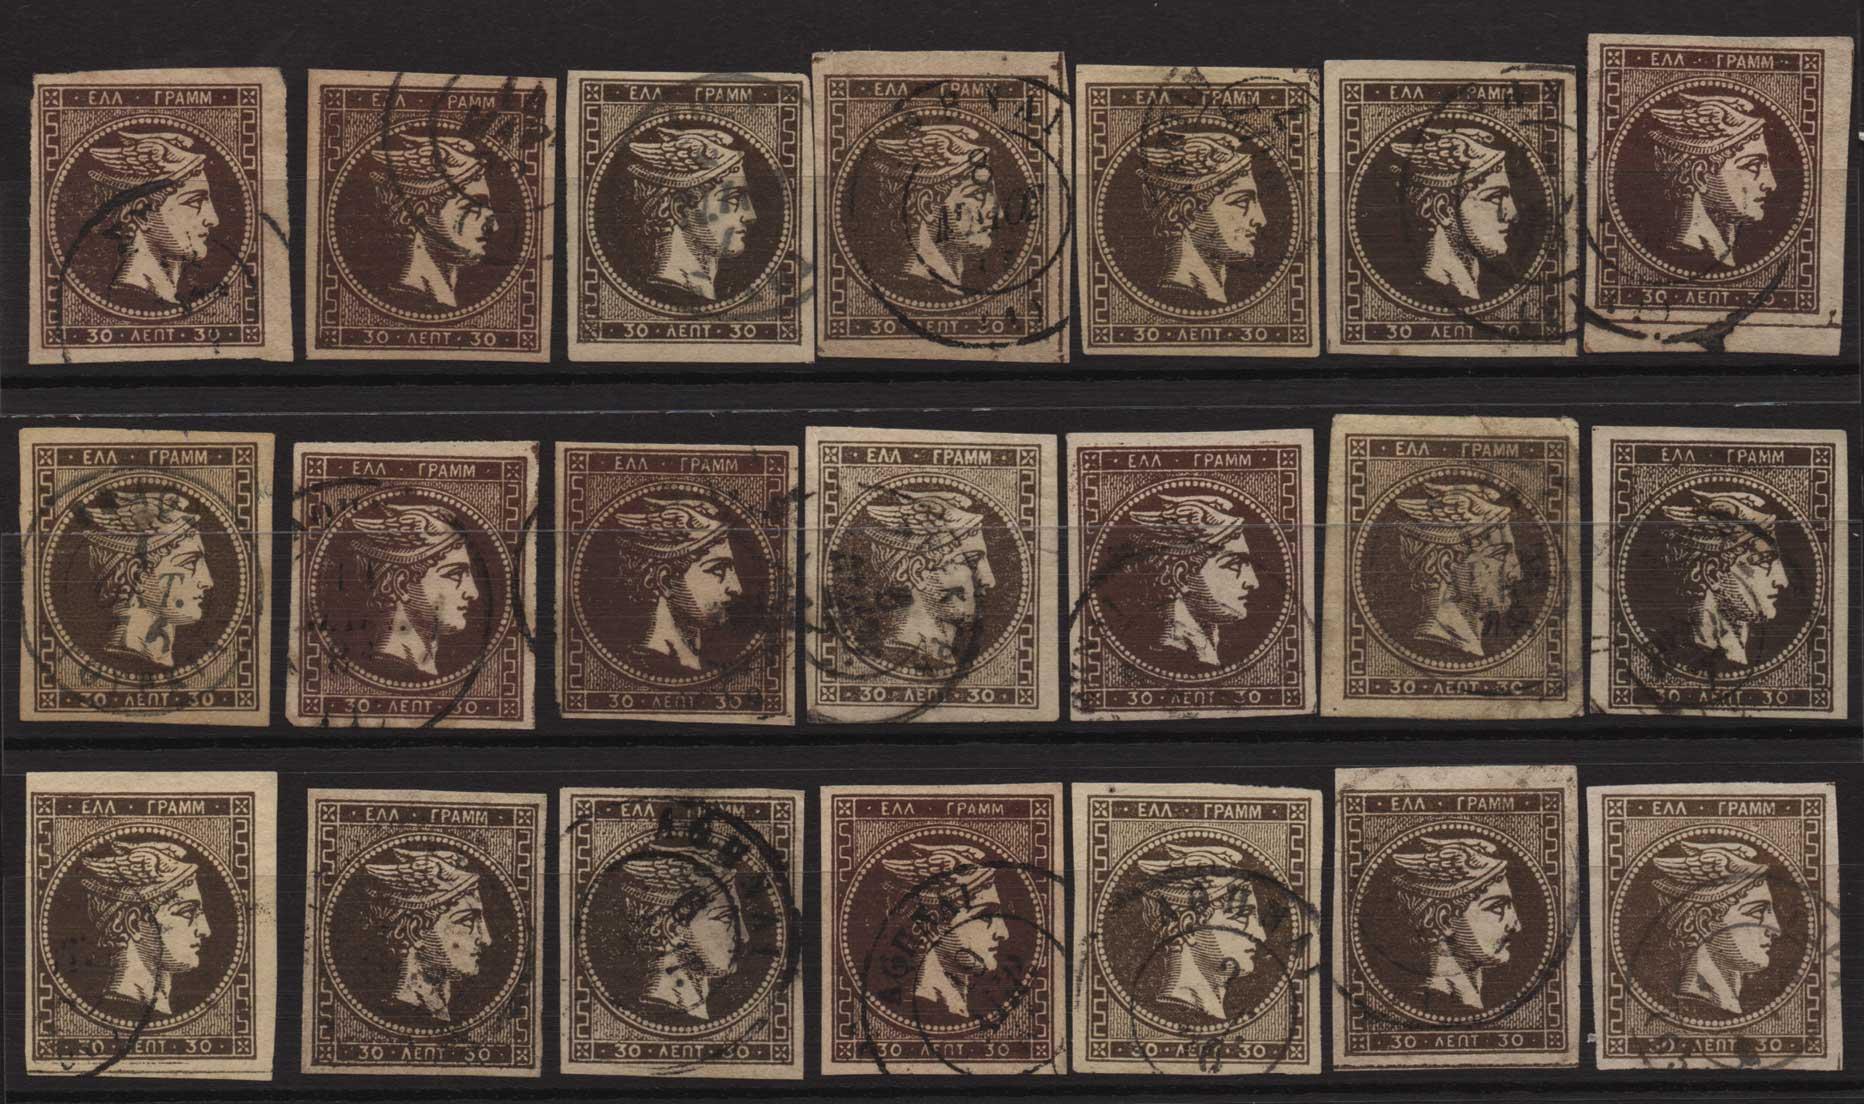 Lot 12 - -  LARGE HERMES HEAD large hermes head -  Athens Auctions Public Auction 85 General Stamp Sale